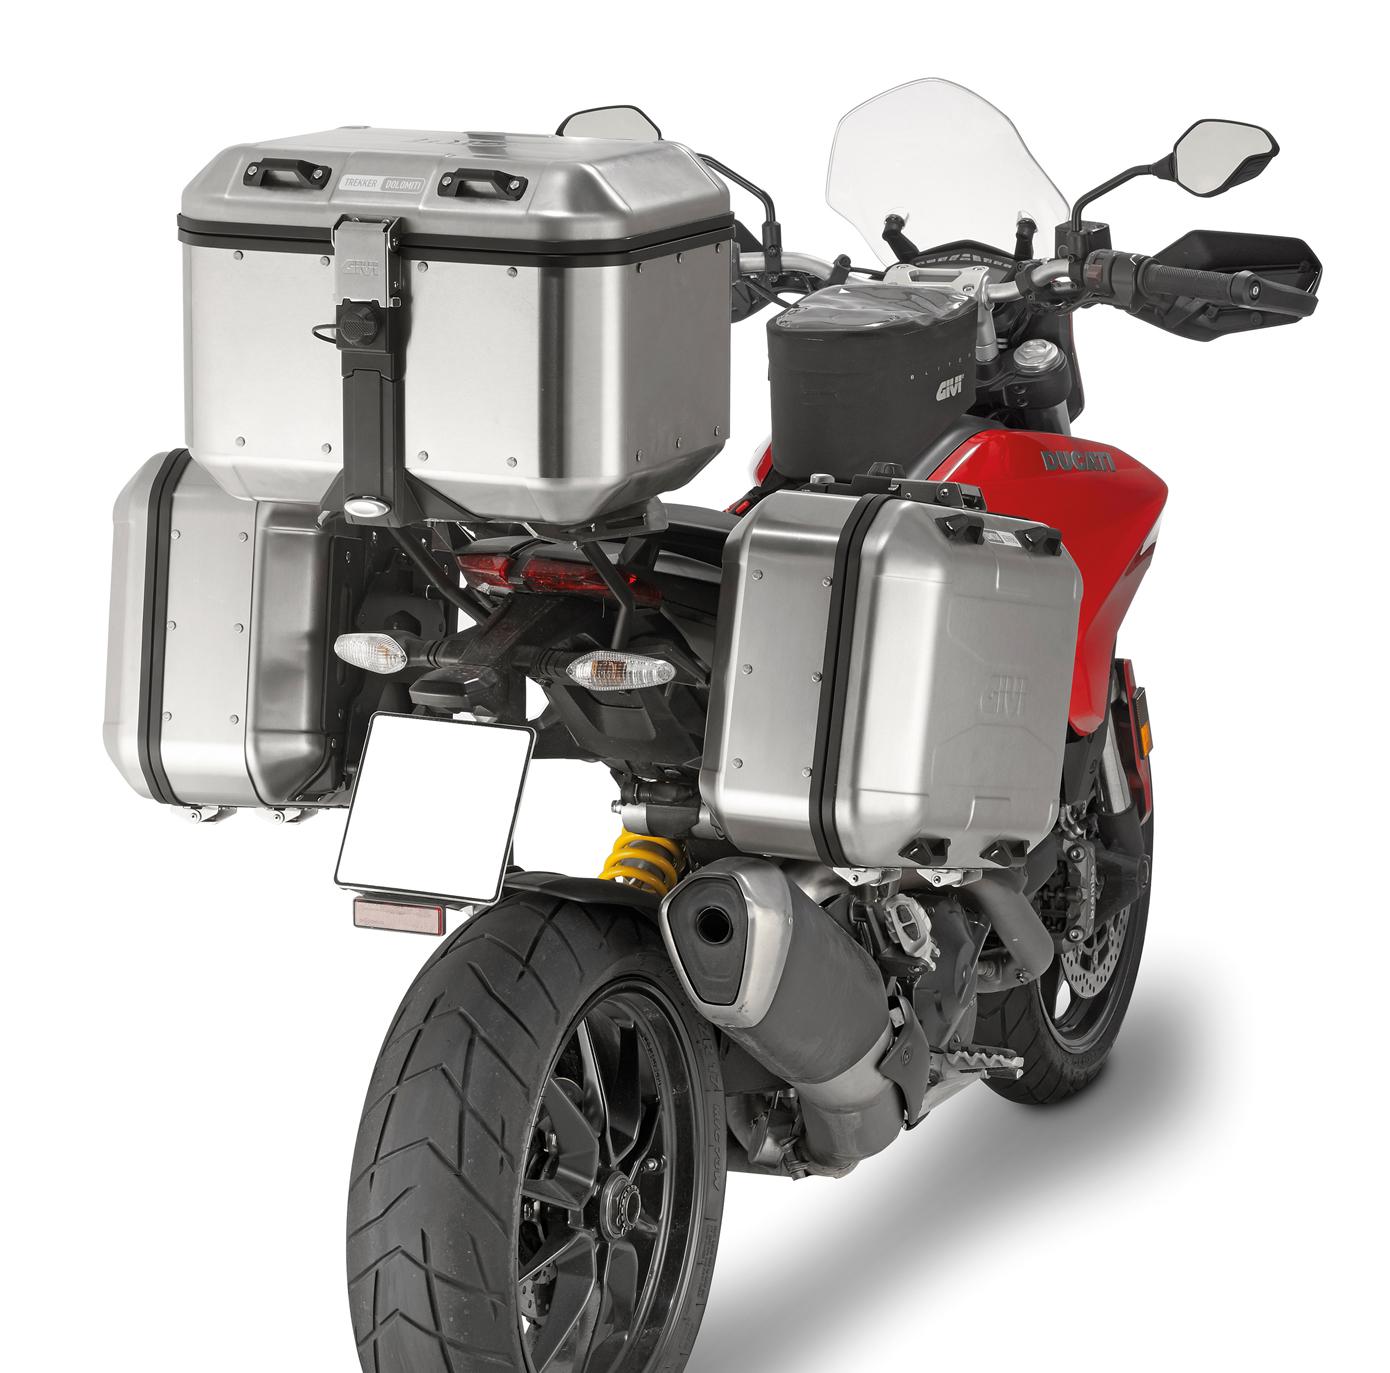 Valigia Givi Dlm30a Per Ducati Scrambler Urban Enduro In Valigie